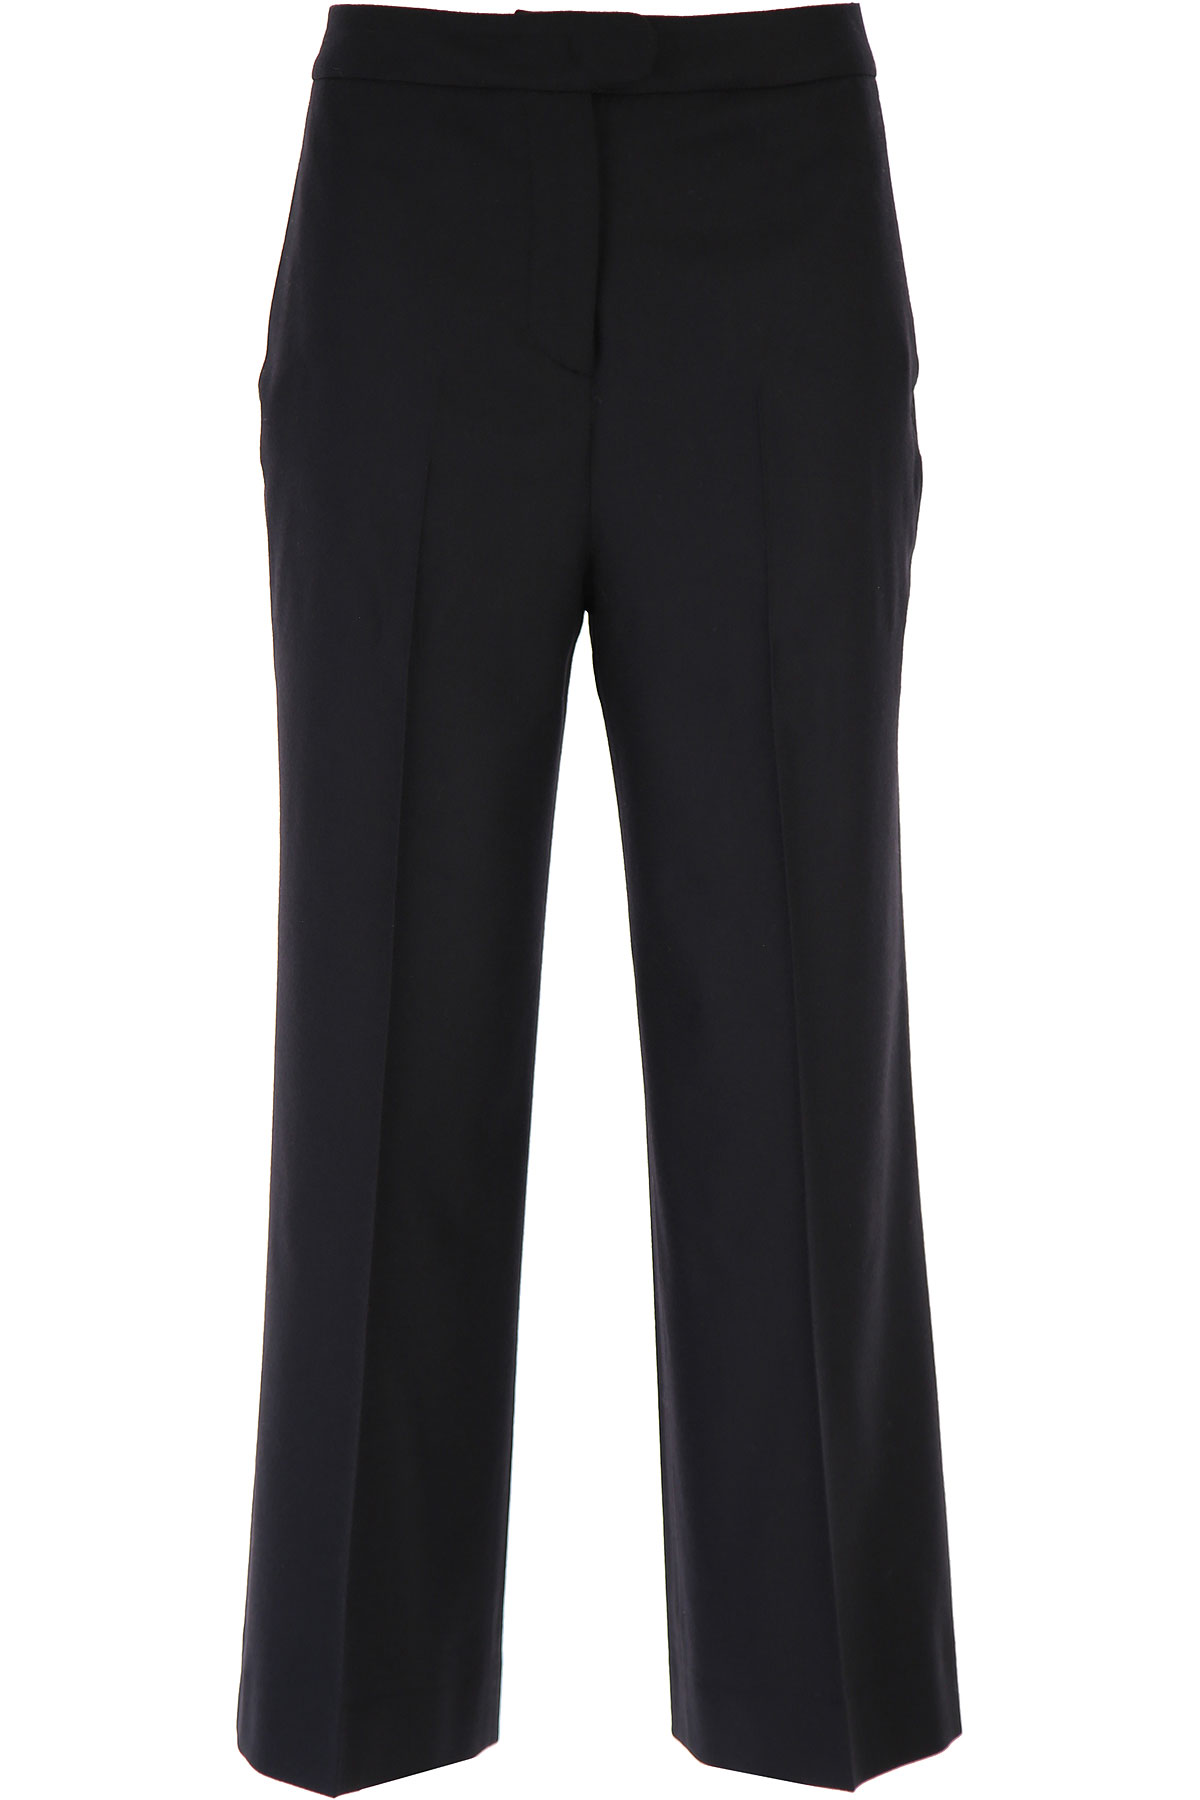 PT01 Pants for Women On Sale, Black, viscosa, 2019, 26 28 30